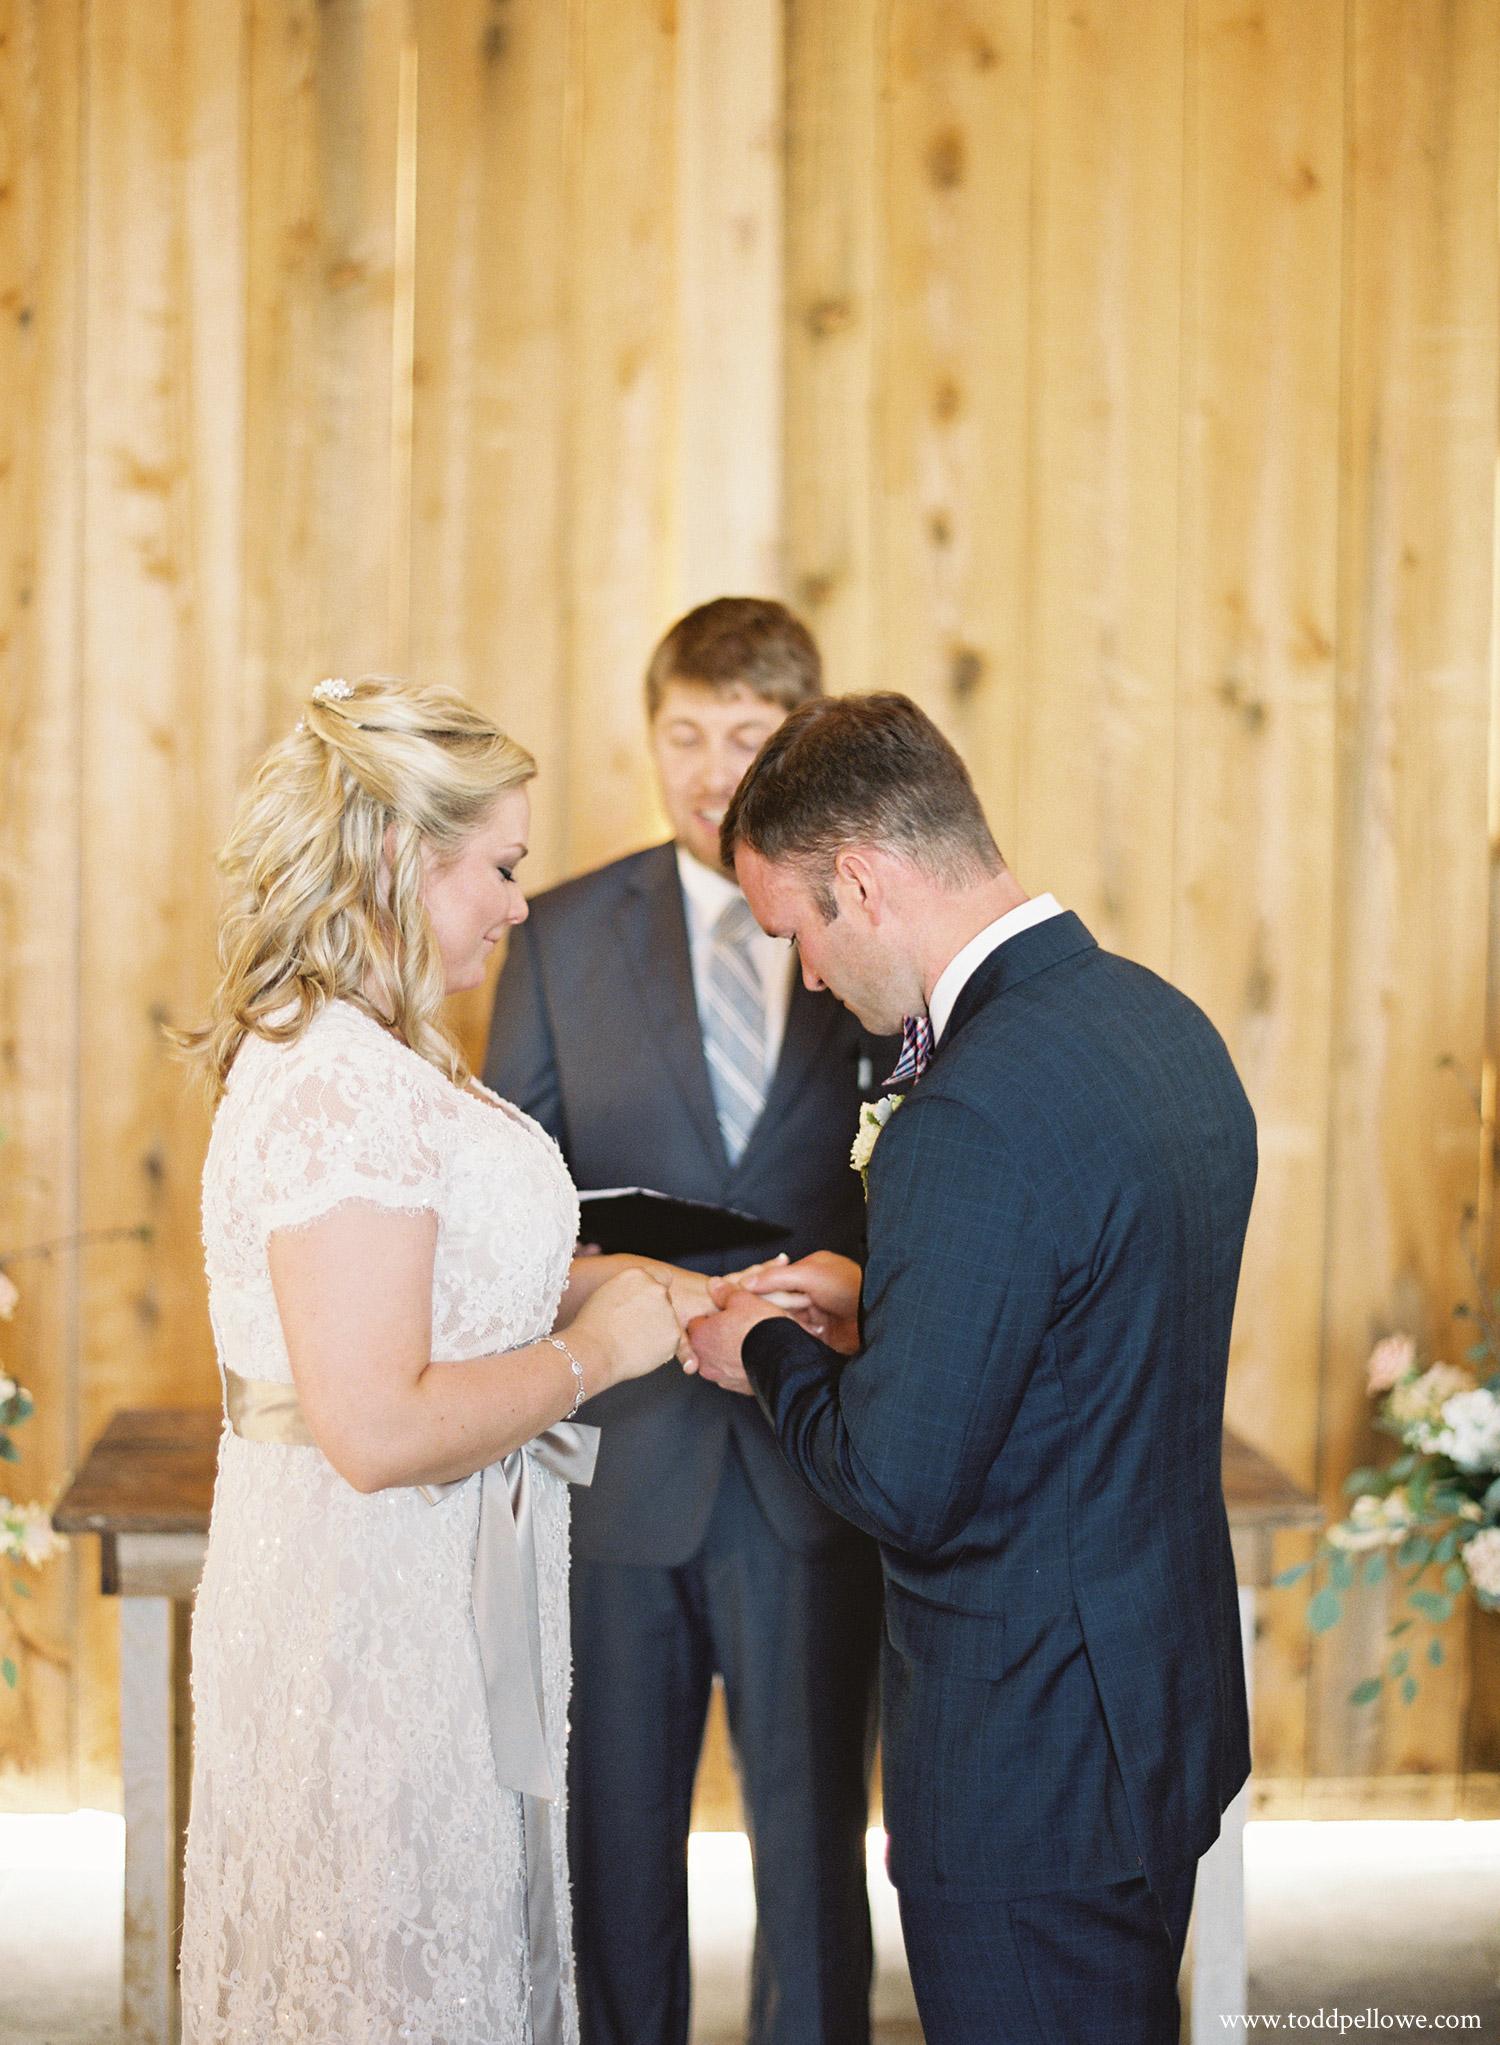 21-long-ridge-farm-wedding-shelbyville-001.jpg